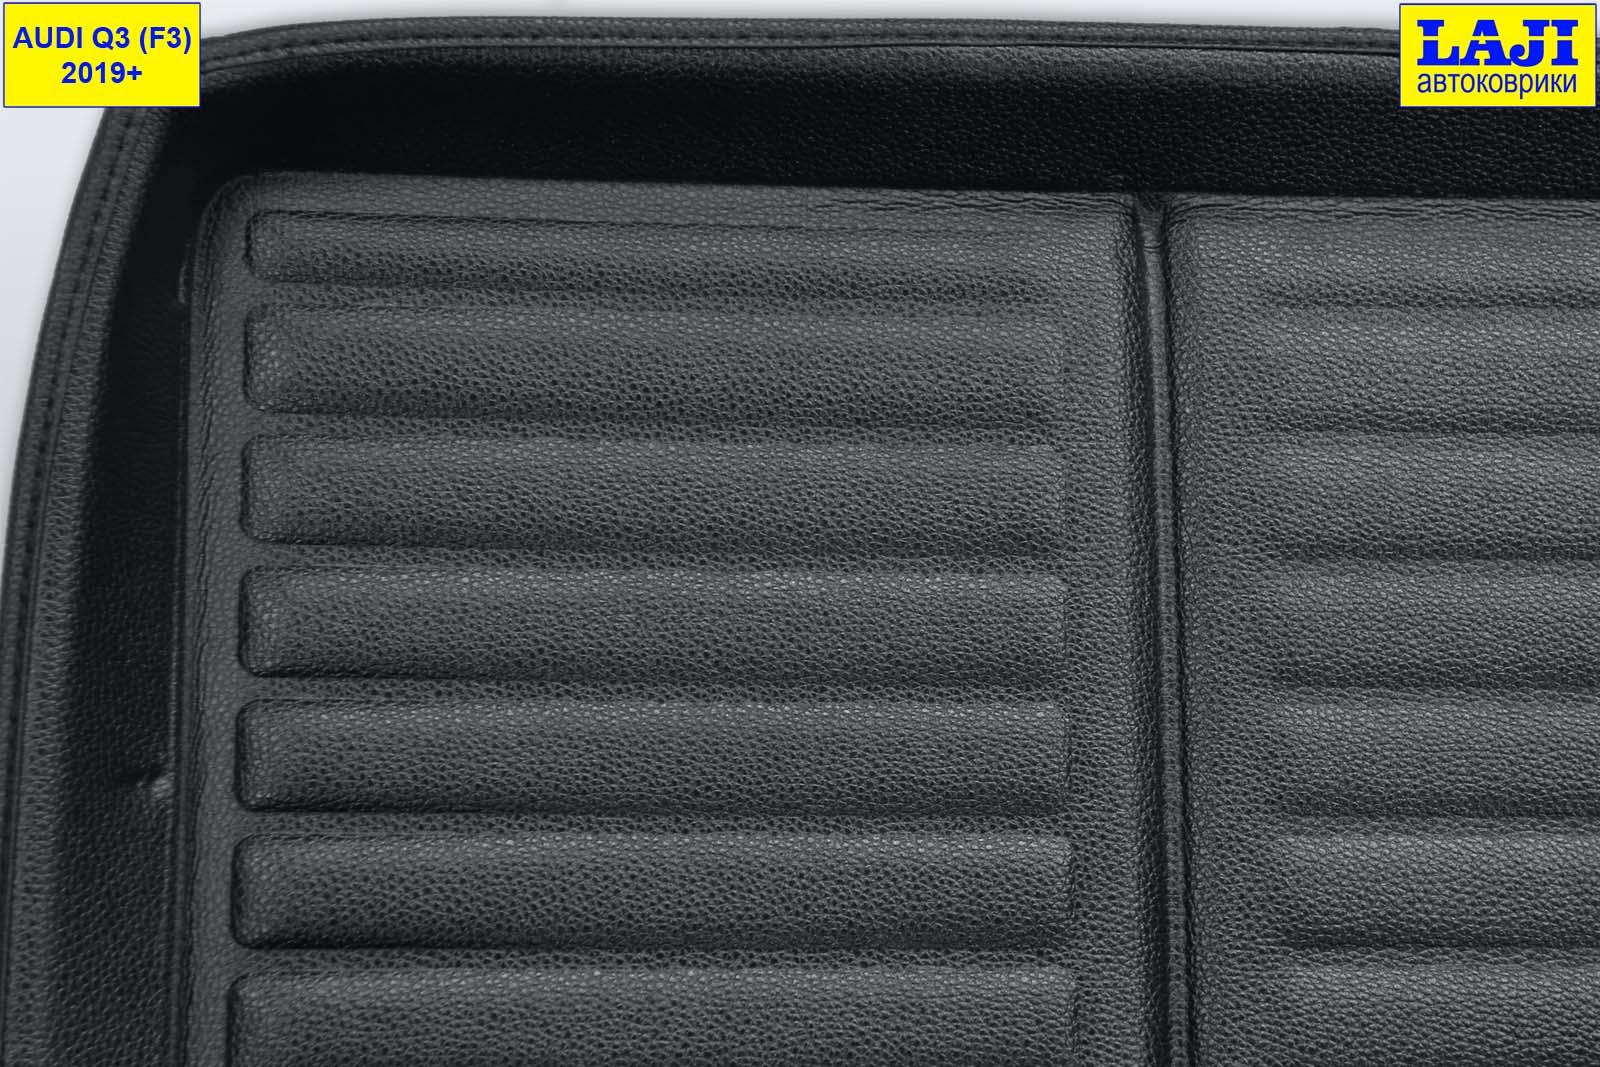 3D коврик в багажник Audi Q3 (F3) 2019-н.в. 3